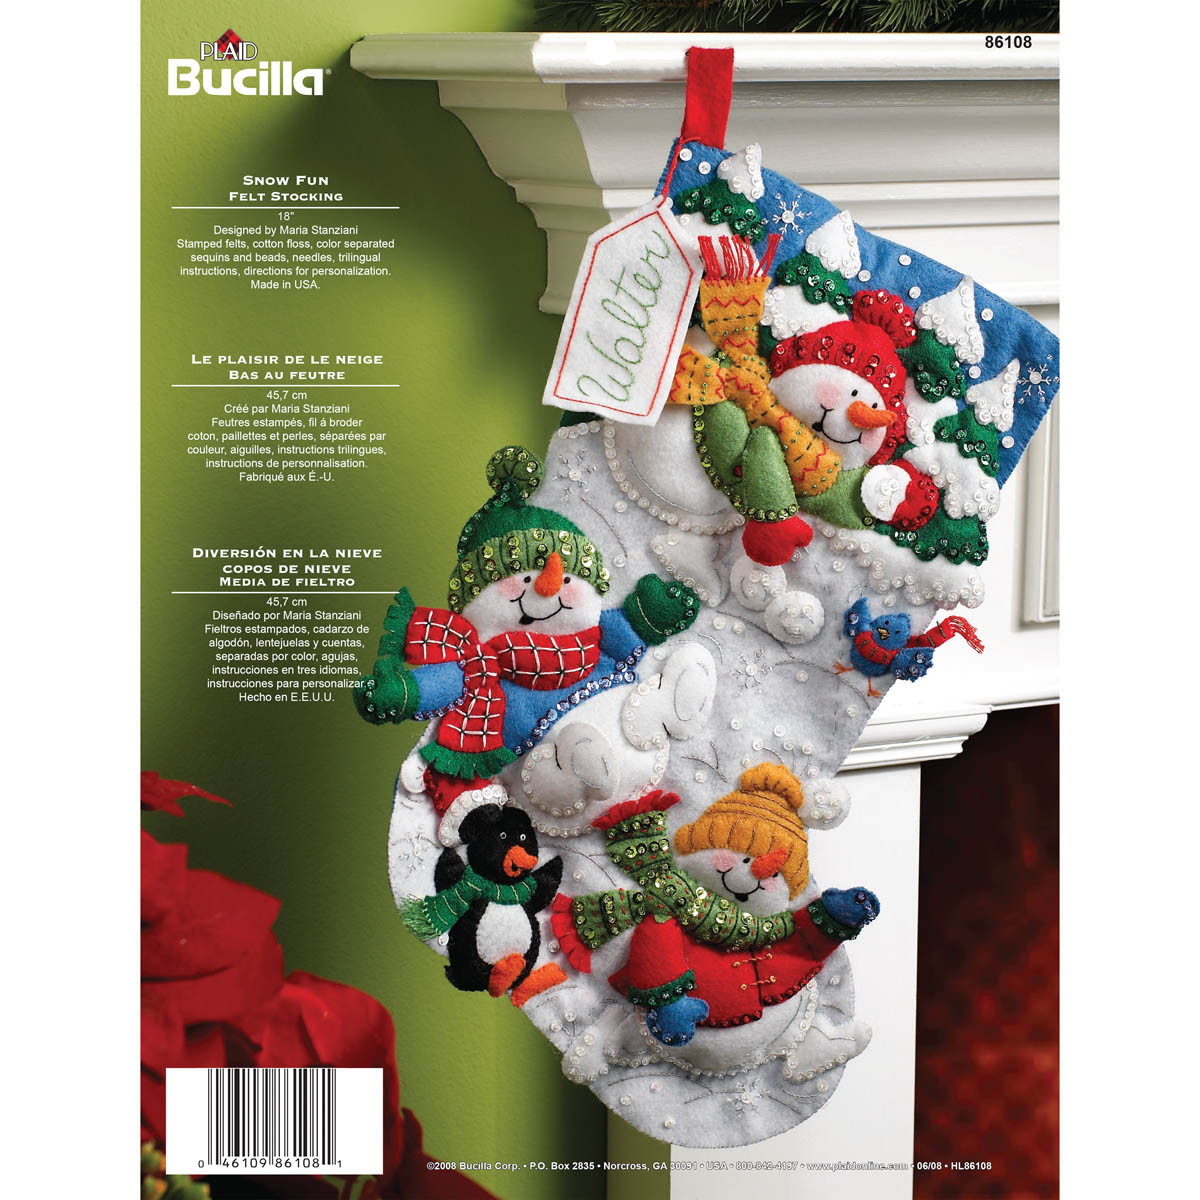 Bucilla ® Seasonal - Felt - Stocking Kits - Snow Fun - 86108